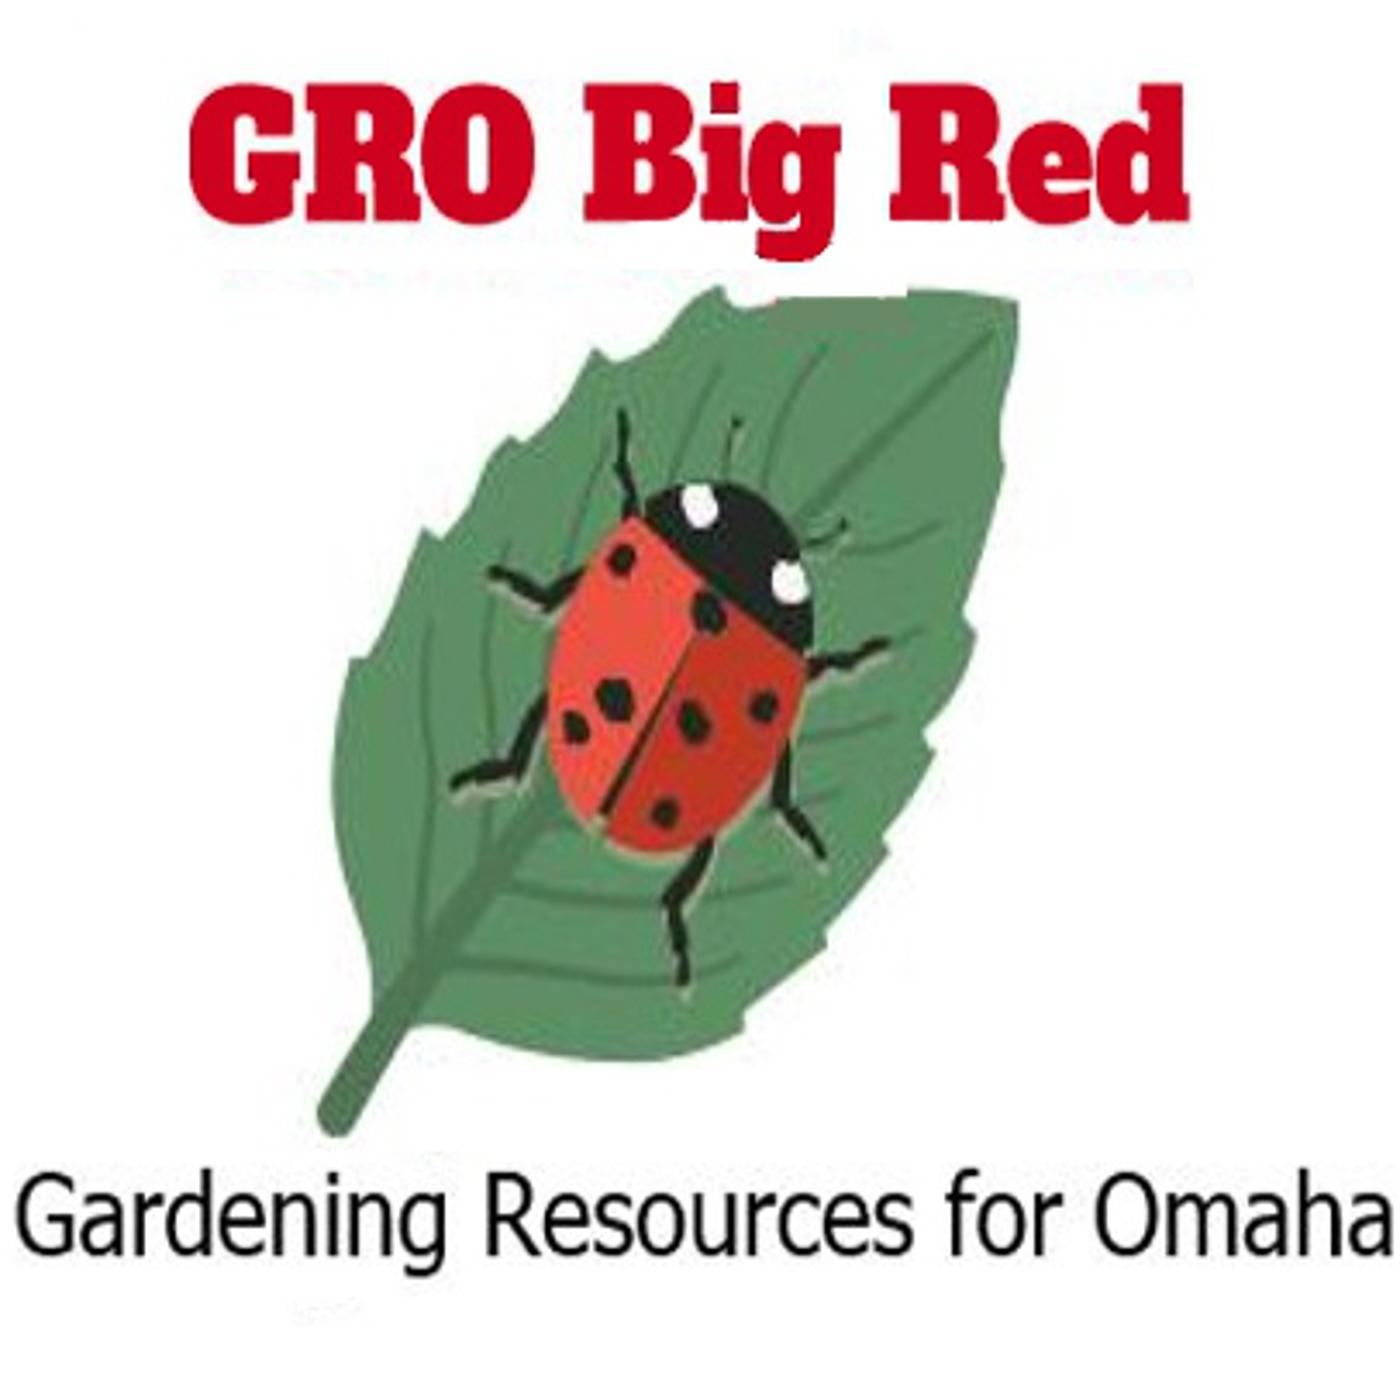 GRO Big Red